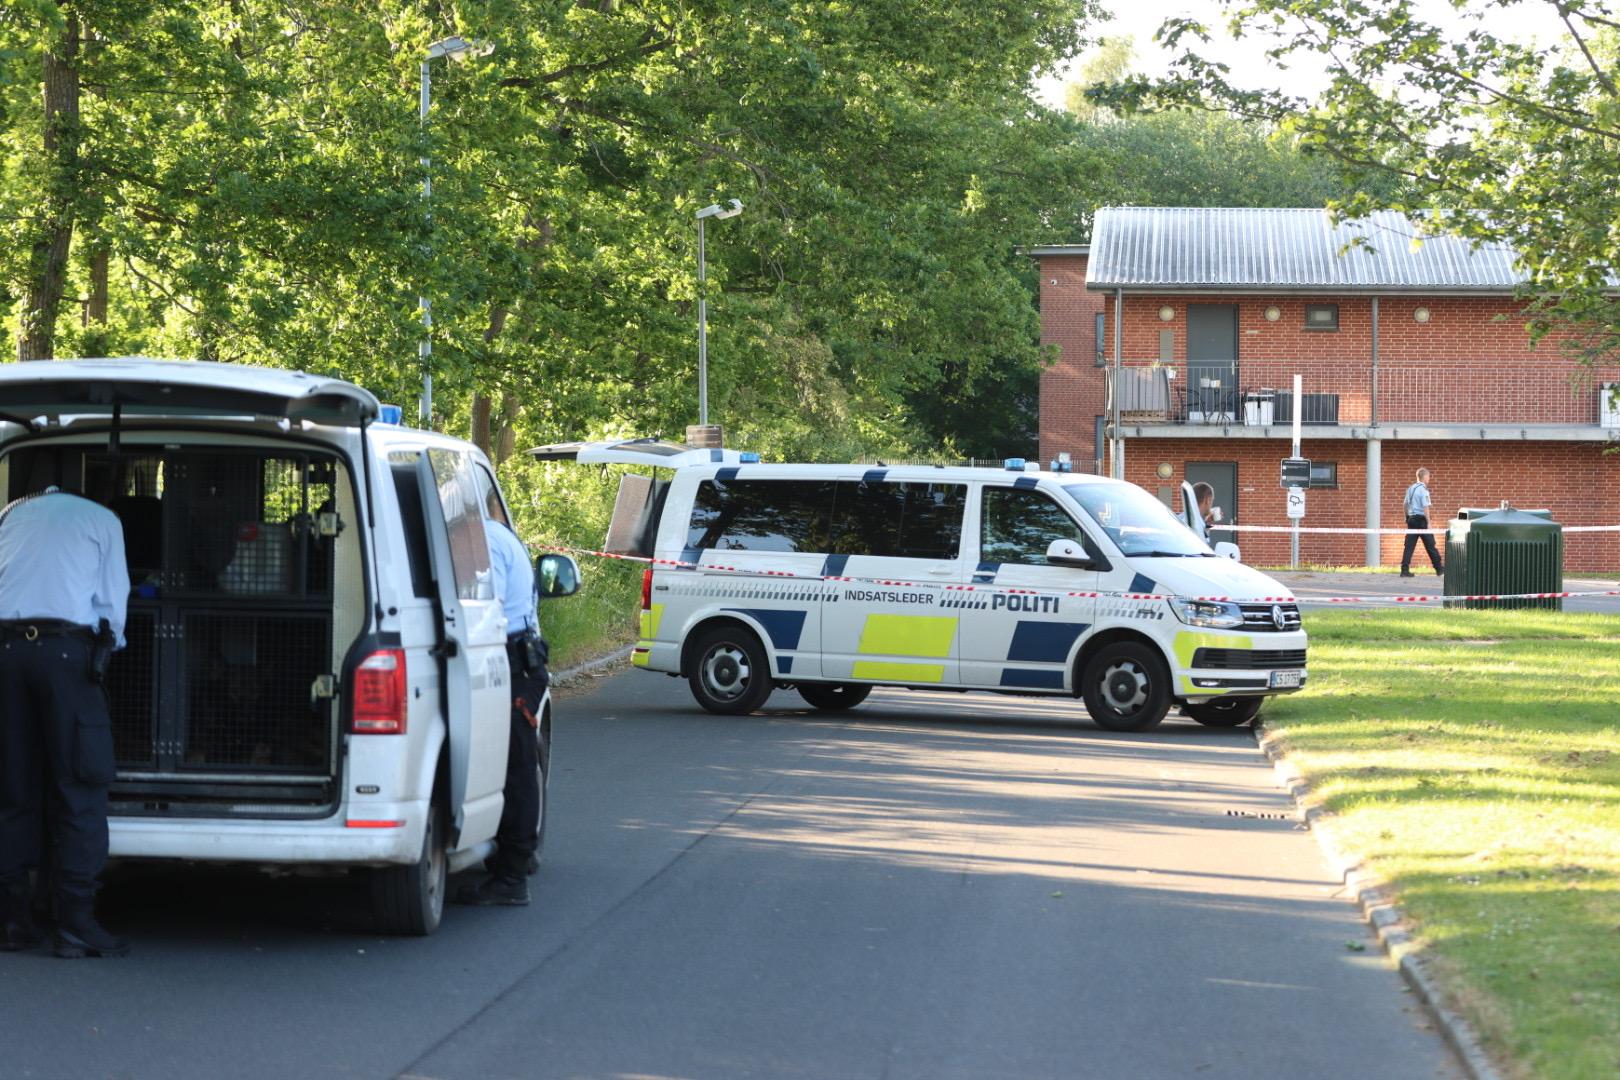 Knivstikkeri i Viby J  - 23 årig mand stukket ned